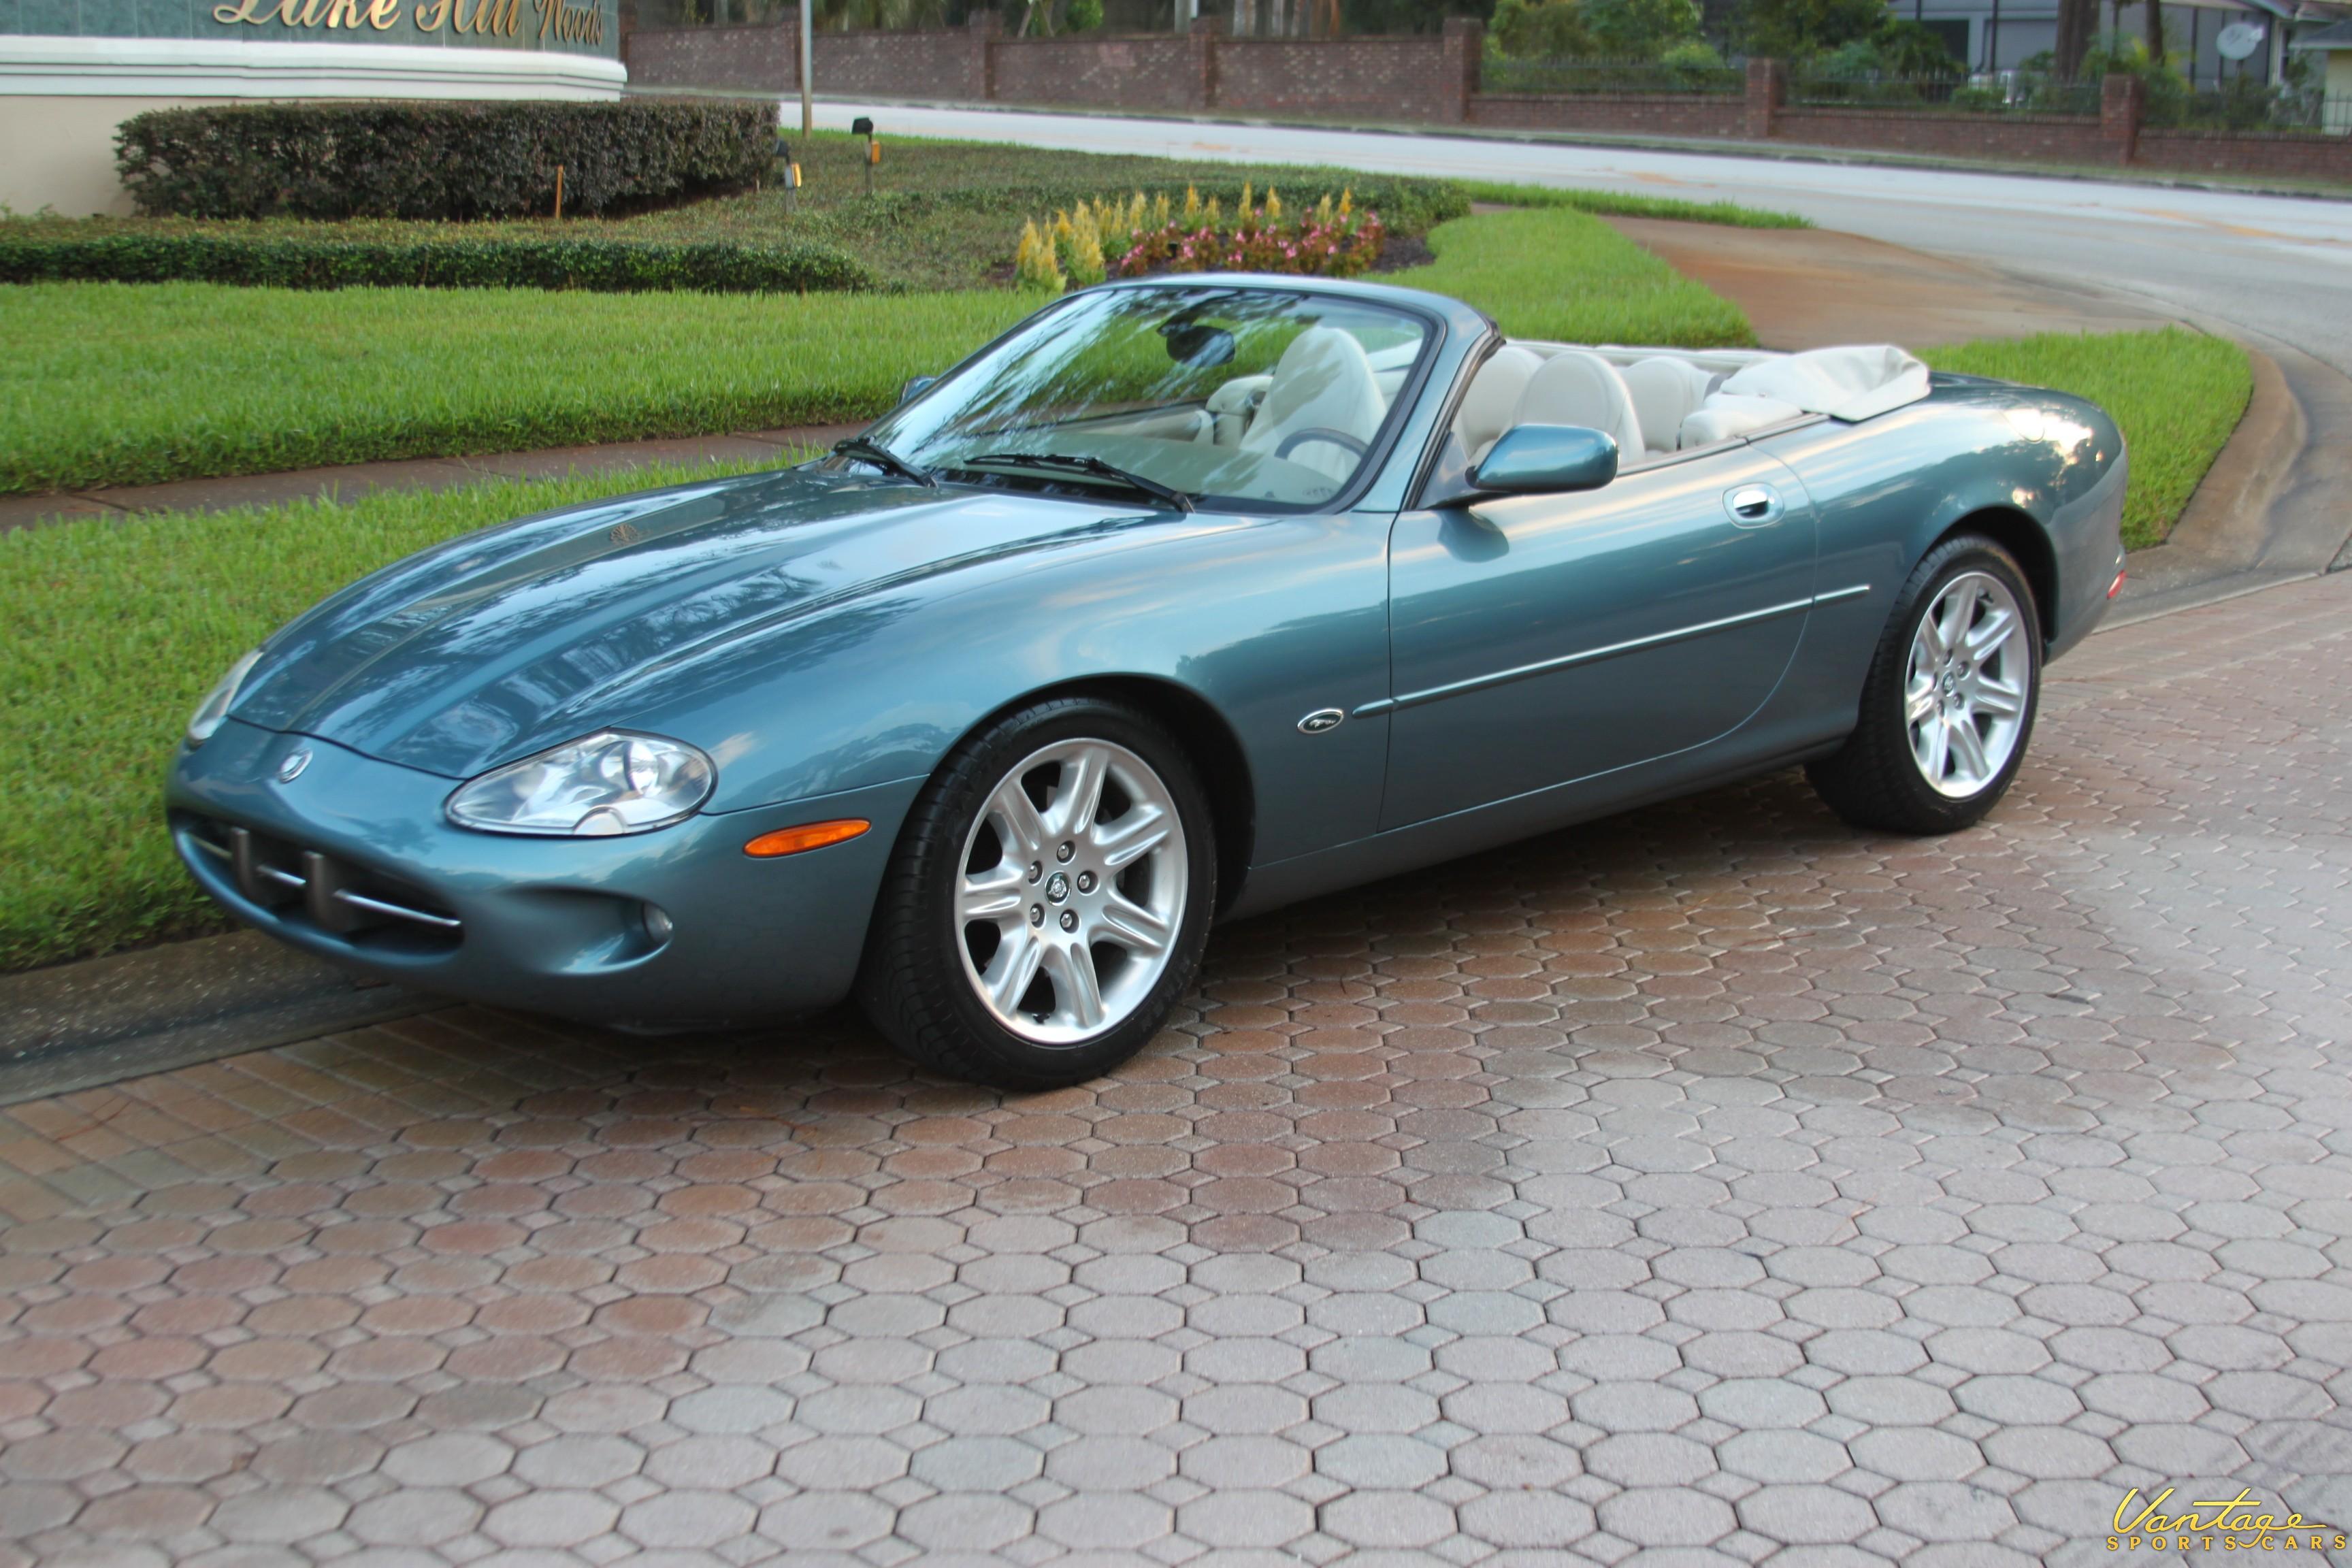 2000 jaguar xk8 convertible rare color low mileage sold vantage sports cars vantage. Black Bedroom Furniture Sets. Home Design Ideas